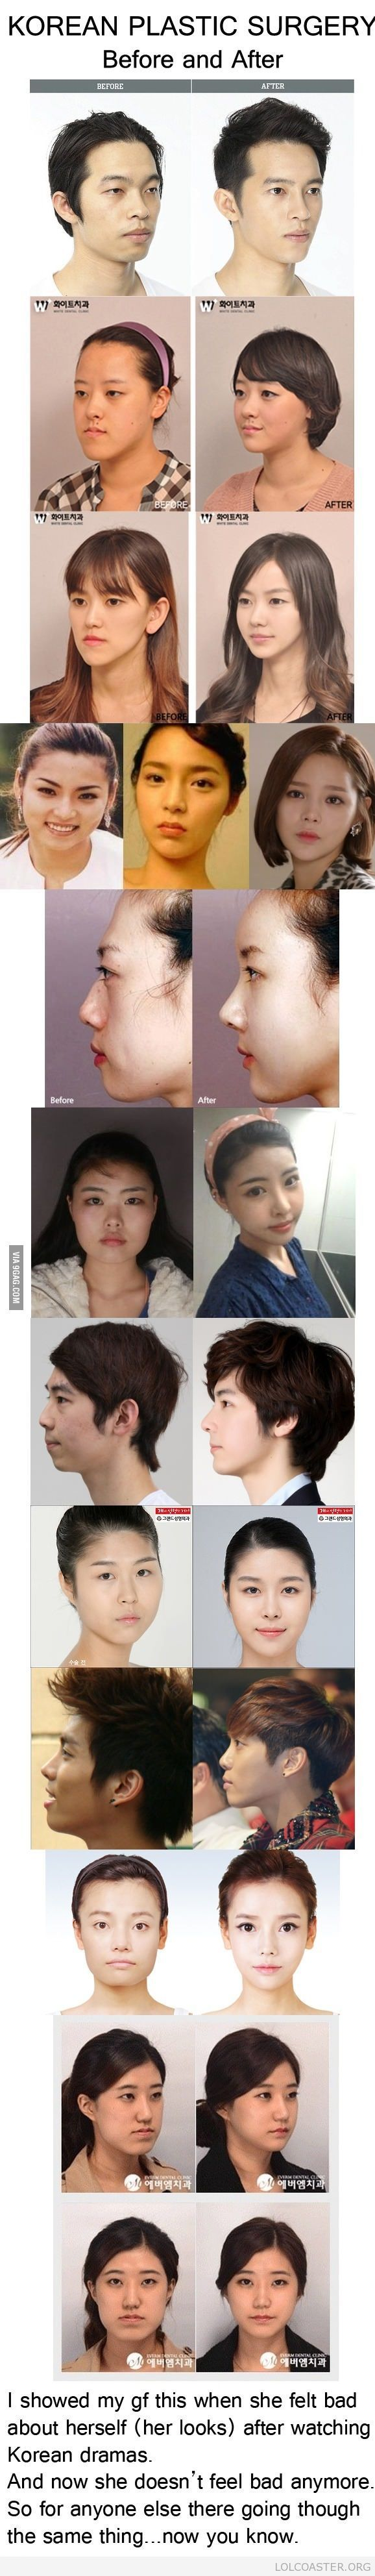 Extreme Korean plastic surgery